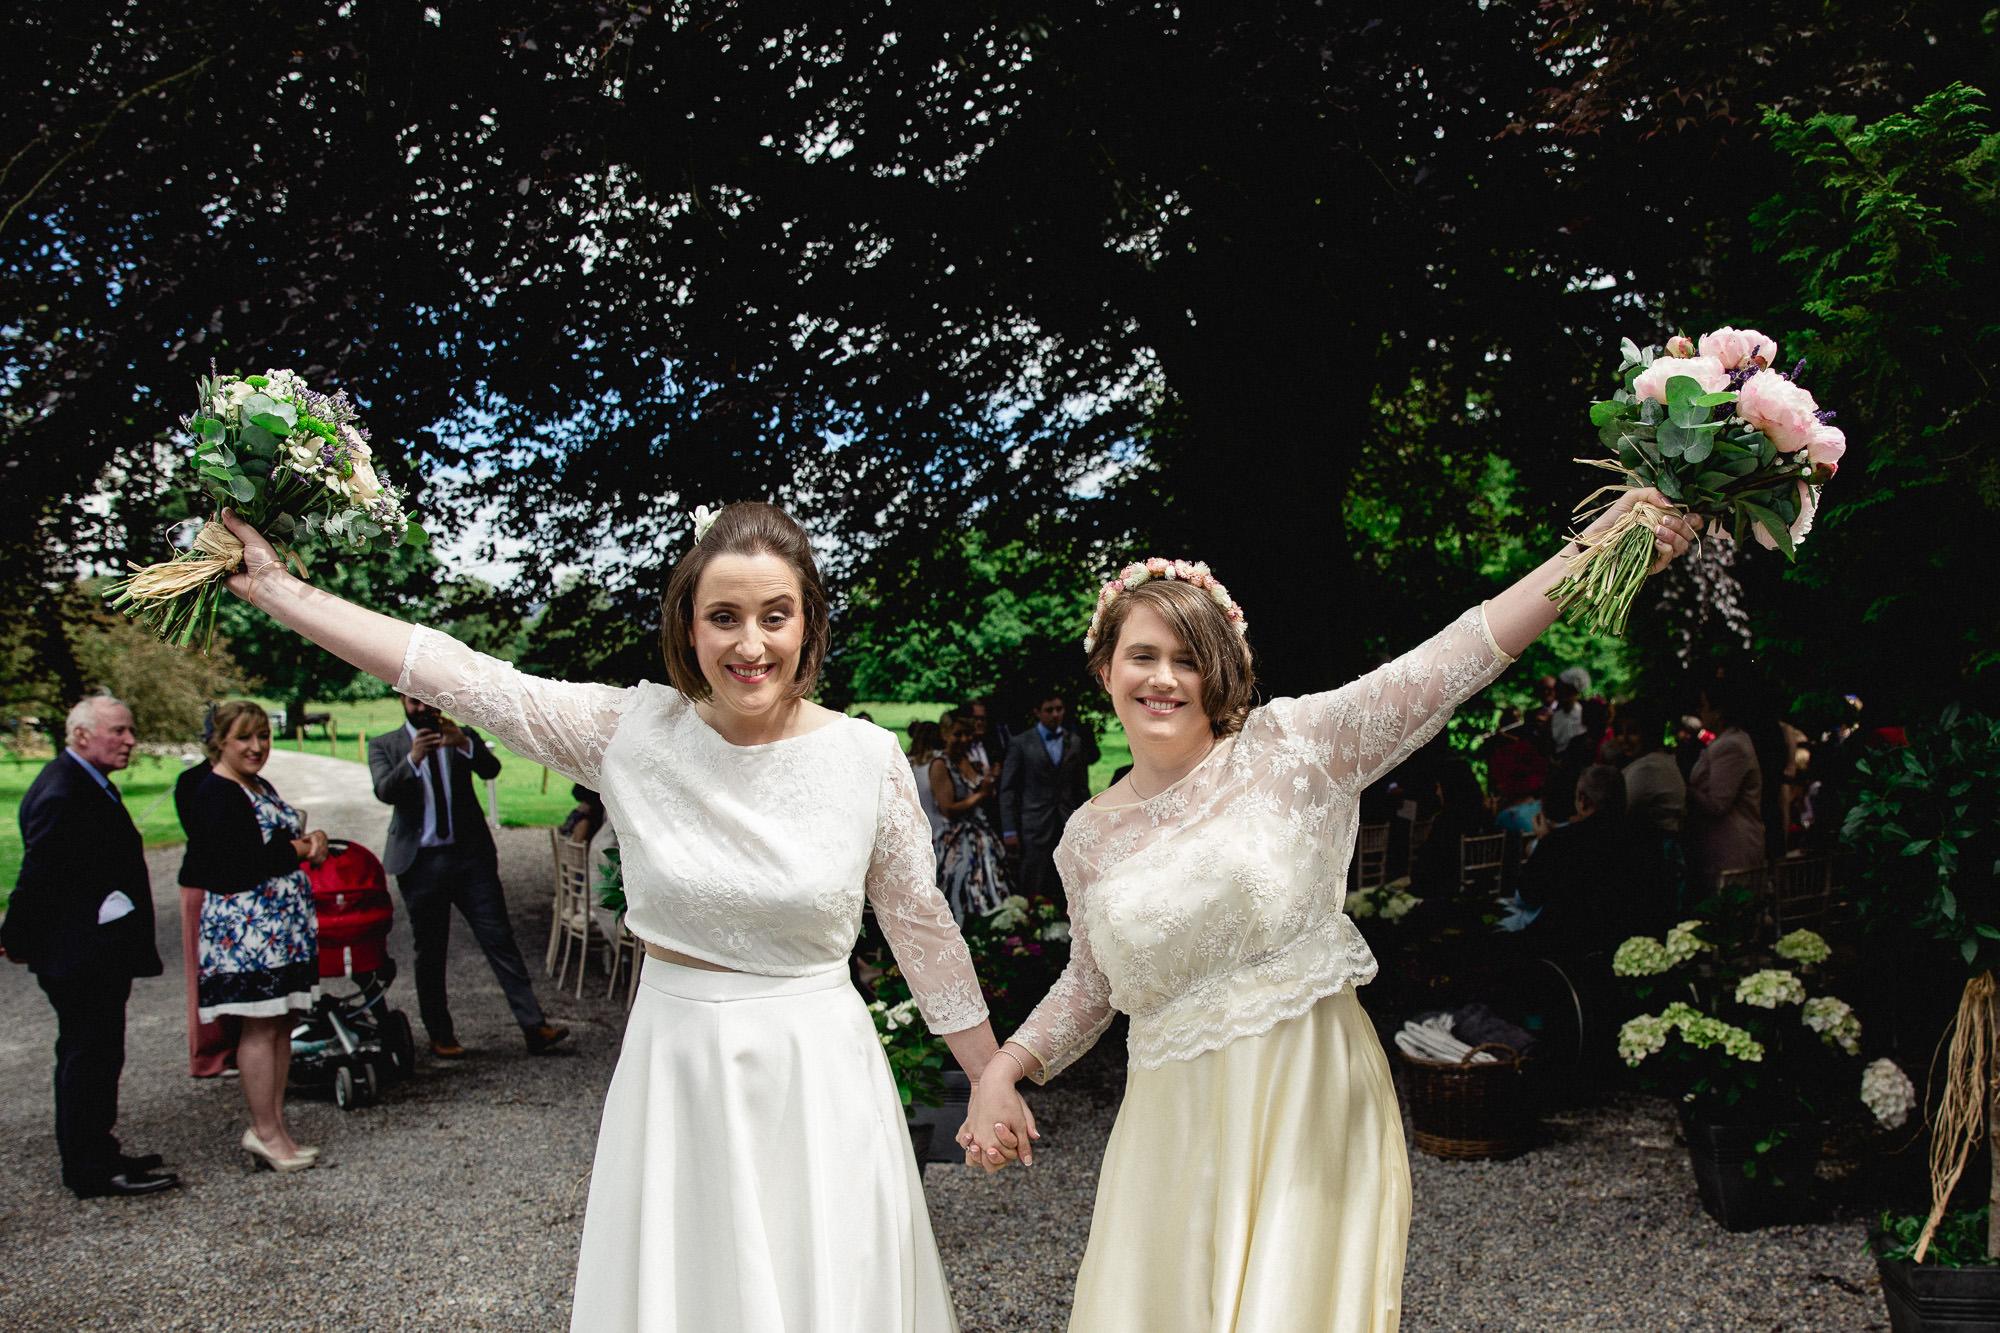 CLAIREBYRNEPHOTOGRAPHY-WEDDING-Ireland-cloncody-alternative-fun-Jen-Helena-2.jpg